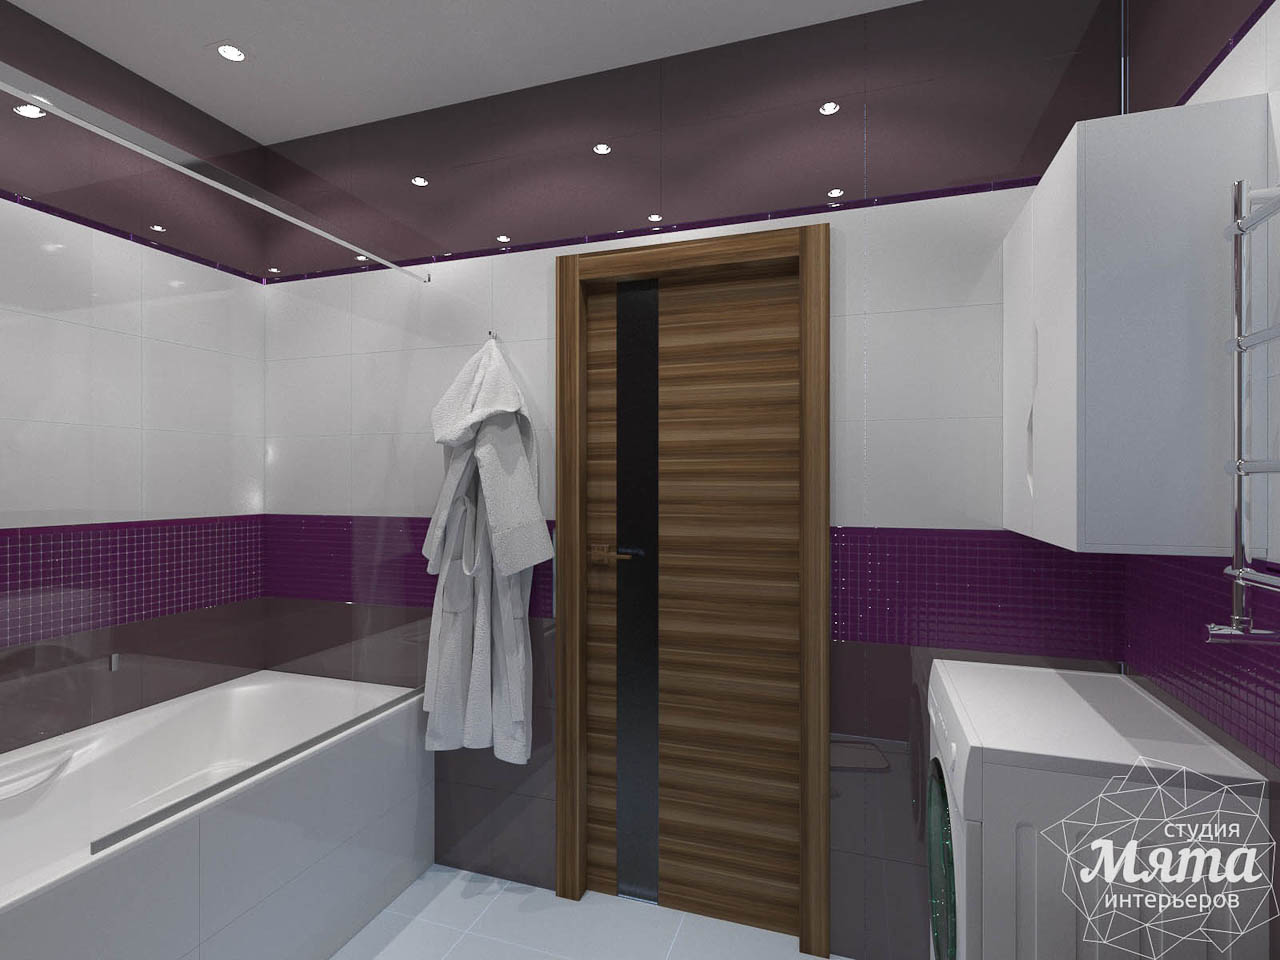 Дизайн интерьера трехкомнатной квартиры по ул. Мельникова 27 img1323039981